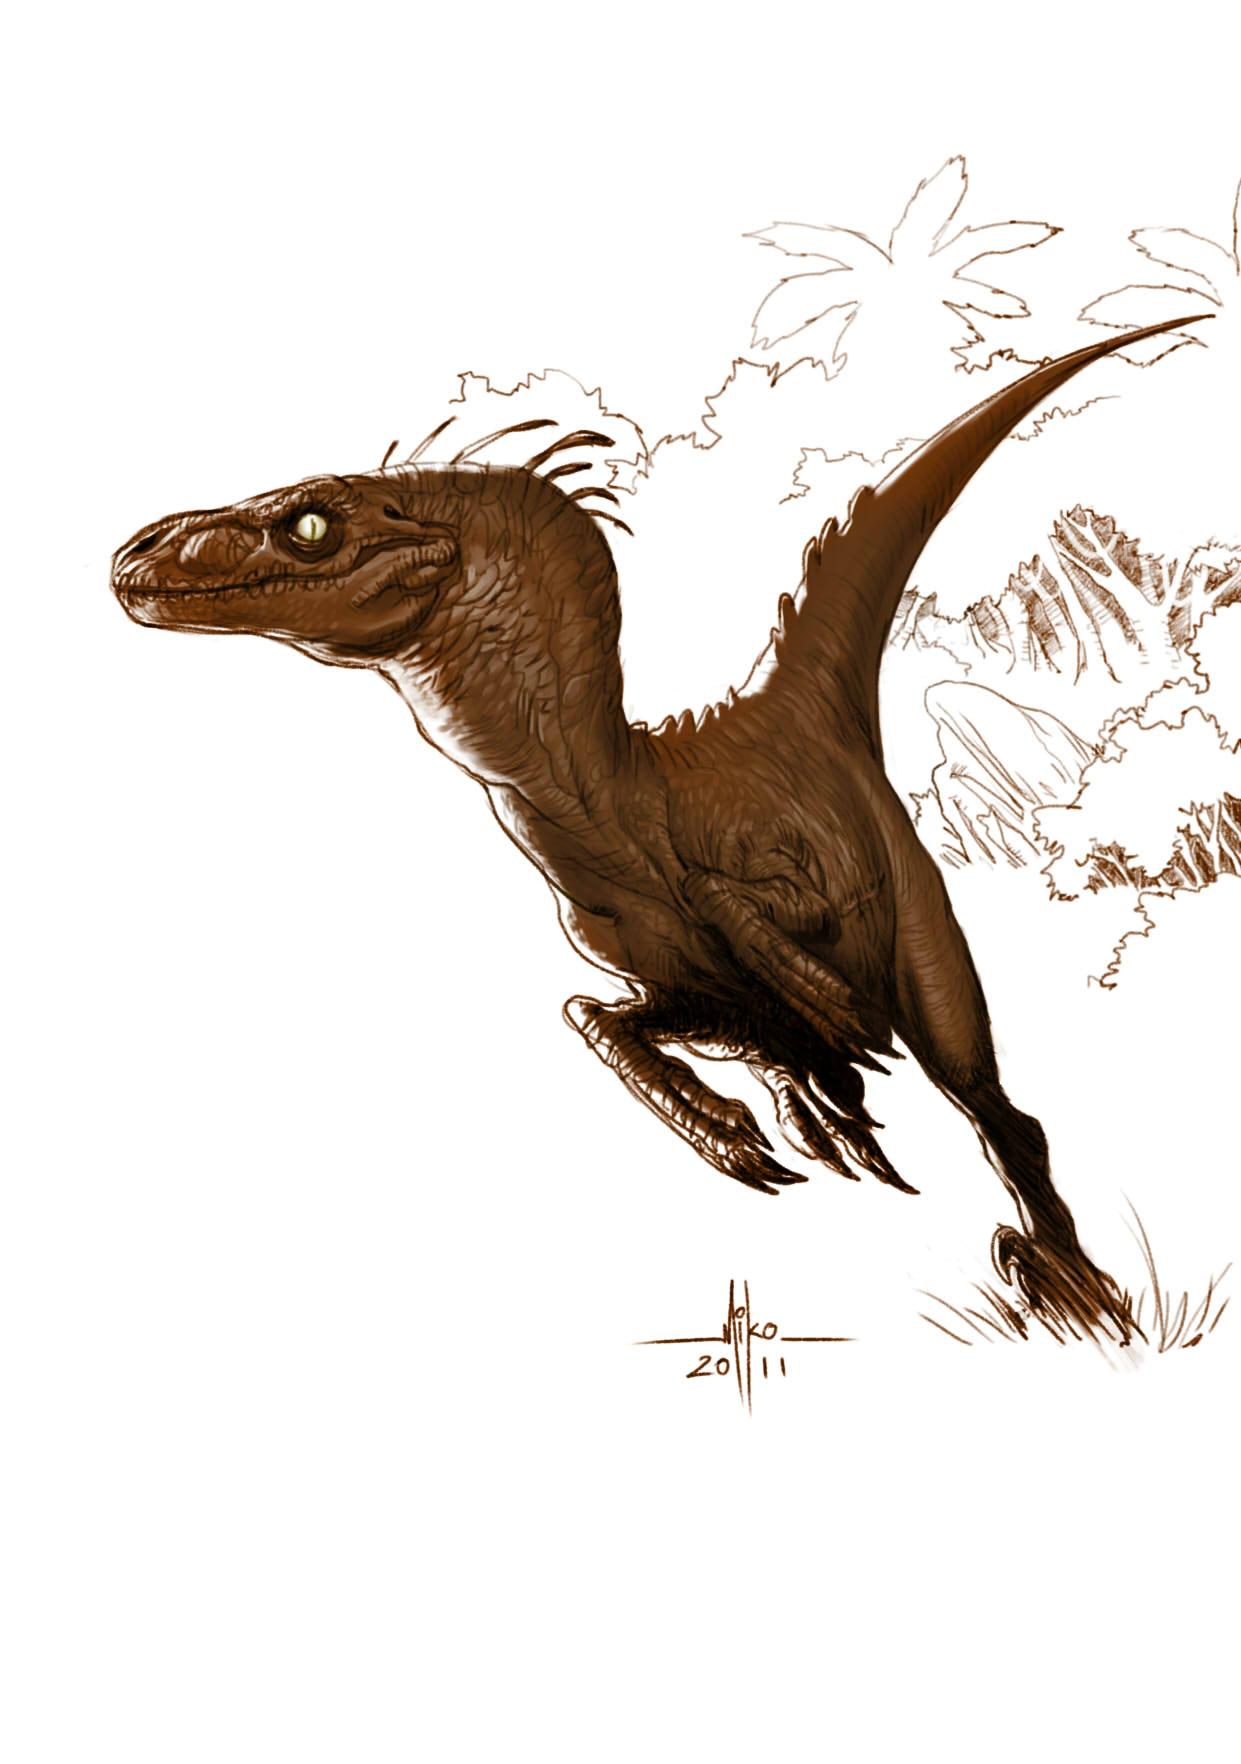 Drawn reptile raptor bird Pinterest terror 1241×1764 pixels ArtStation